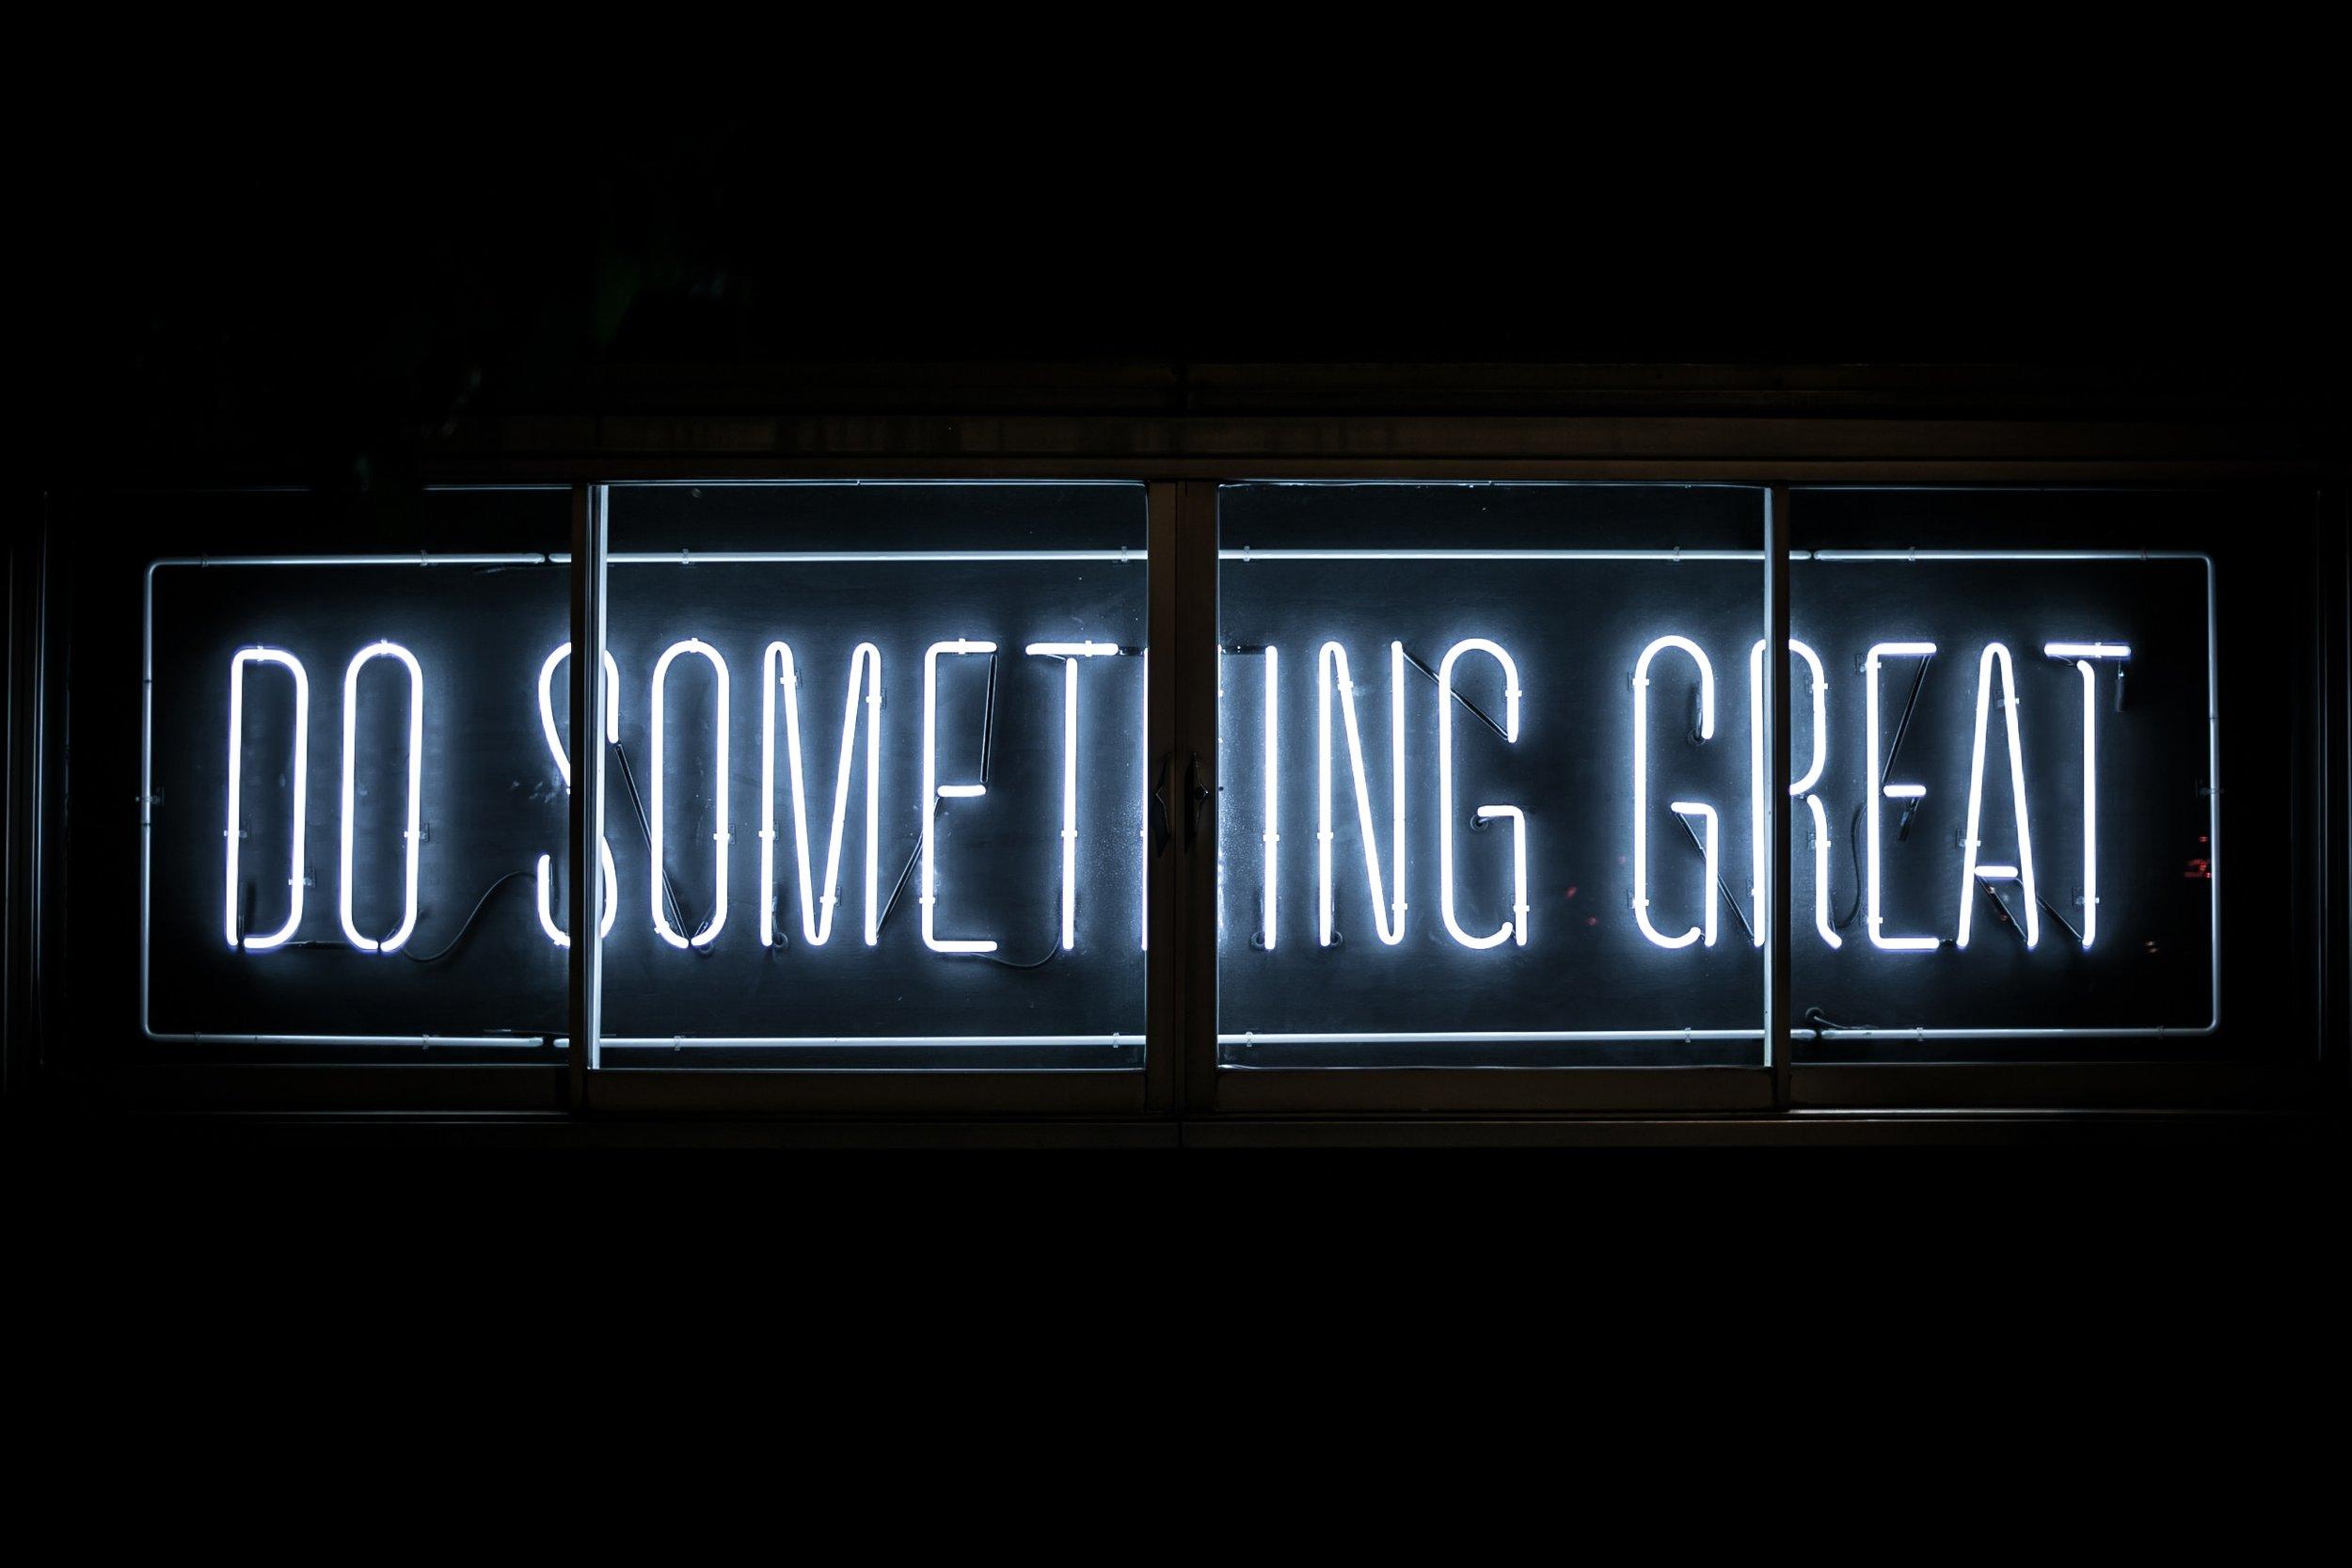 Do something great by Benjamin Steele